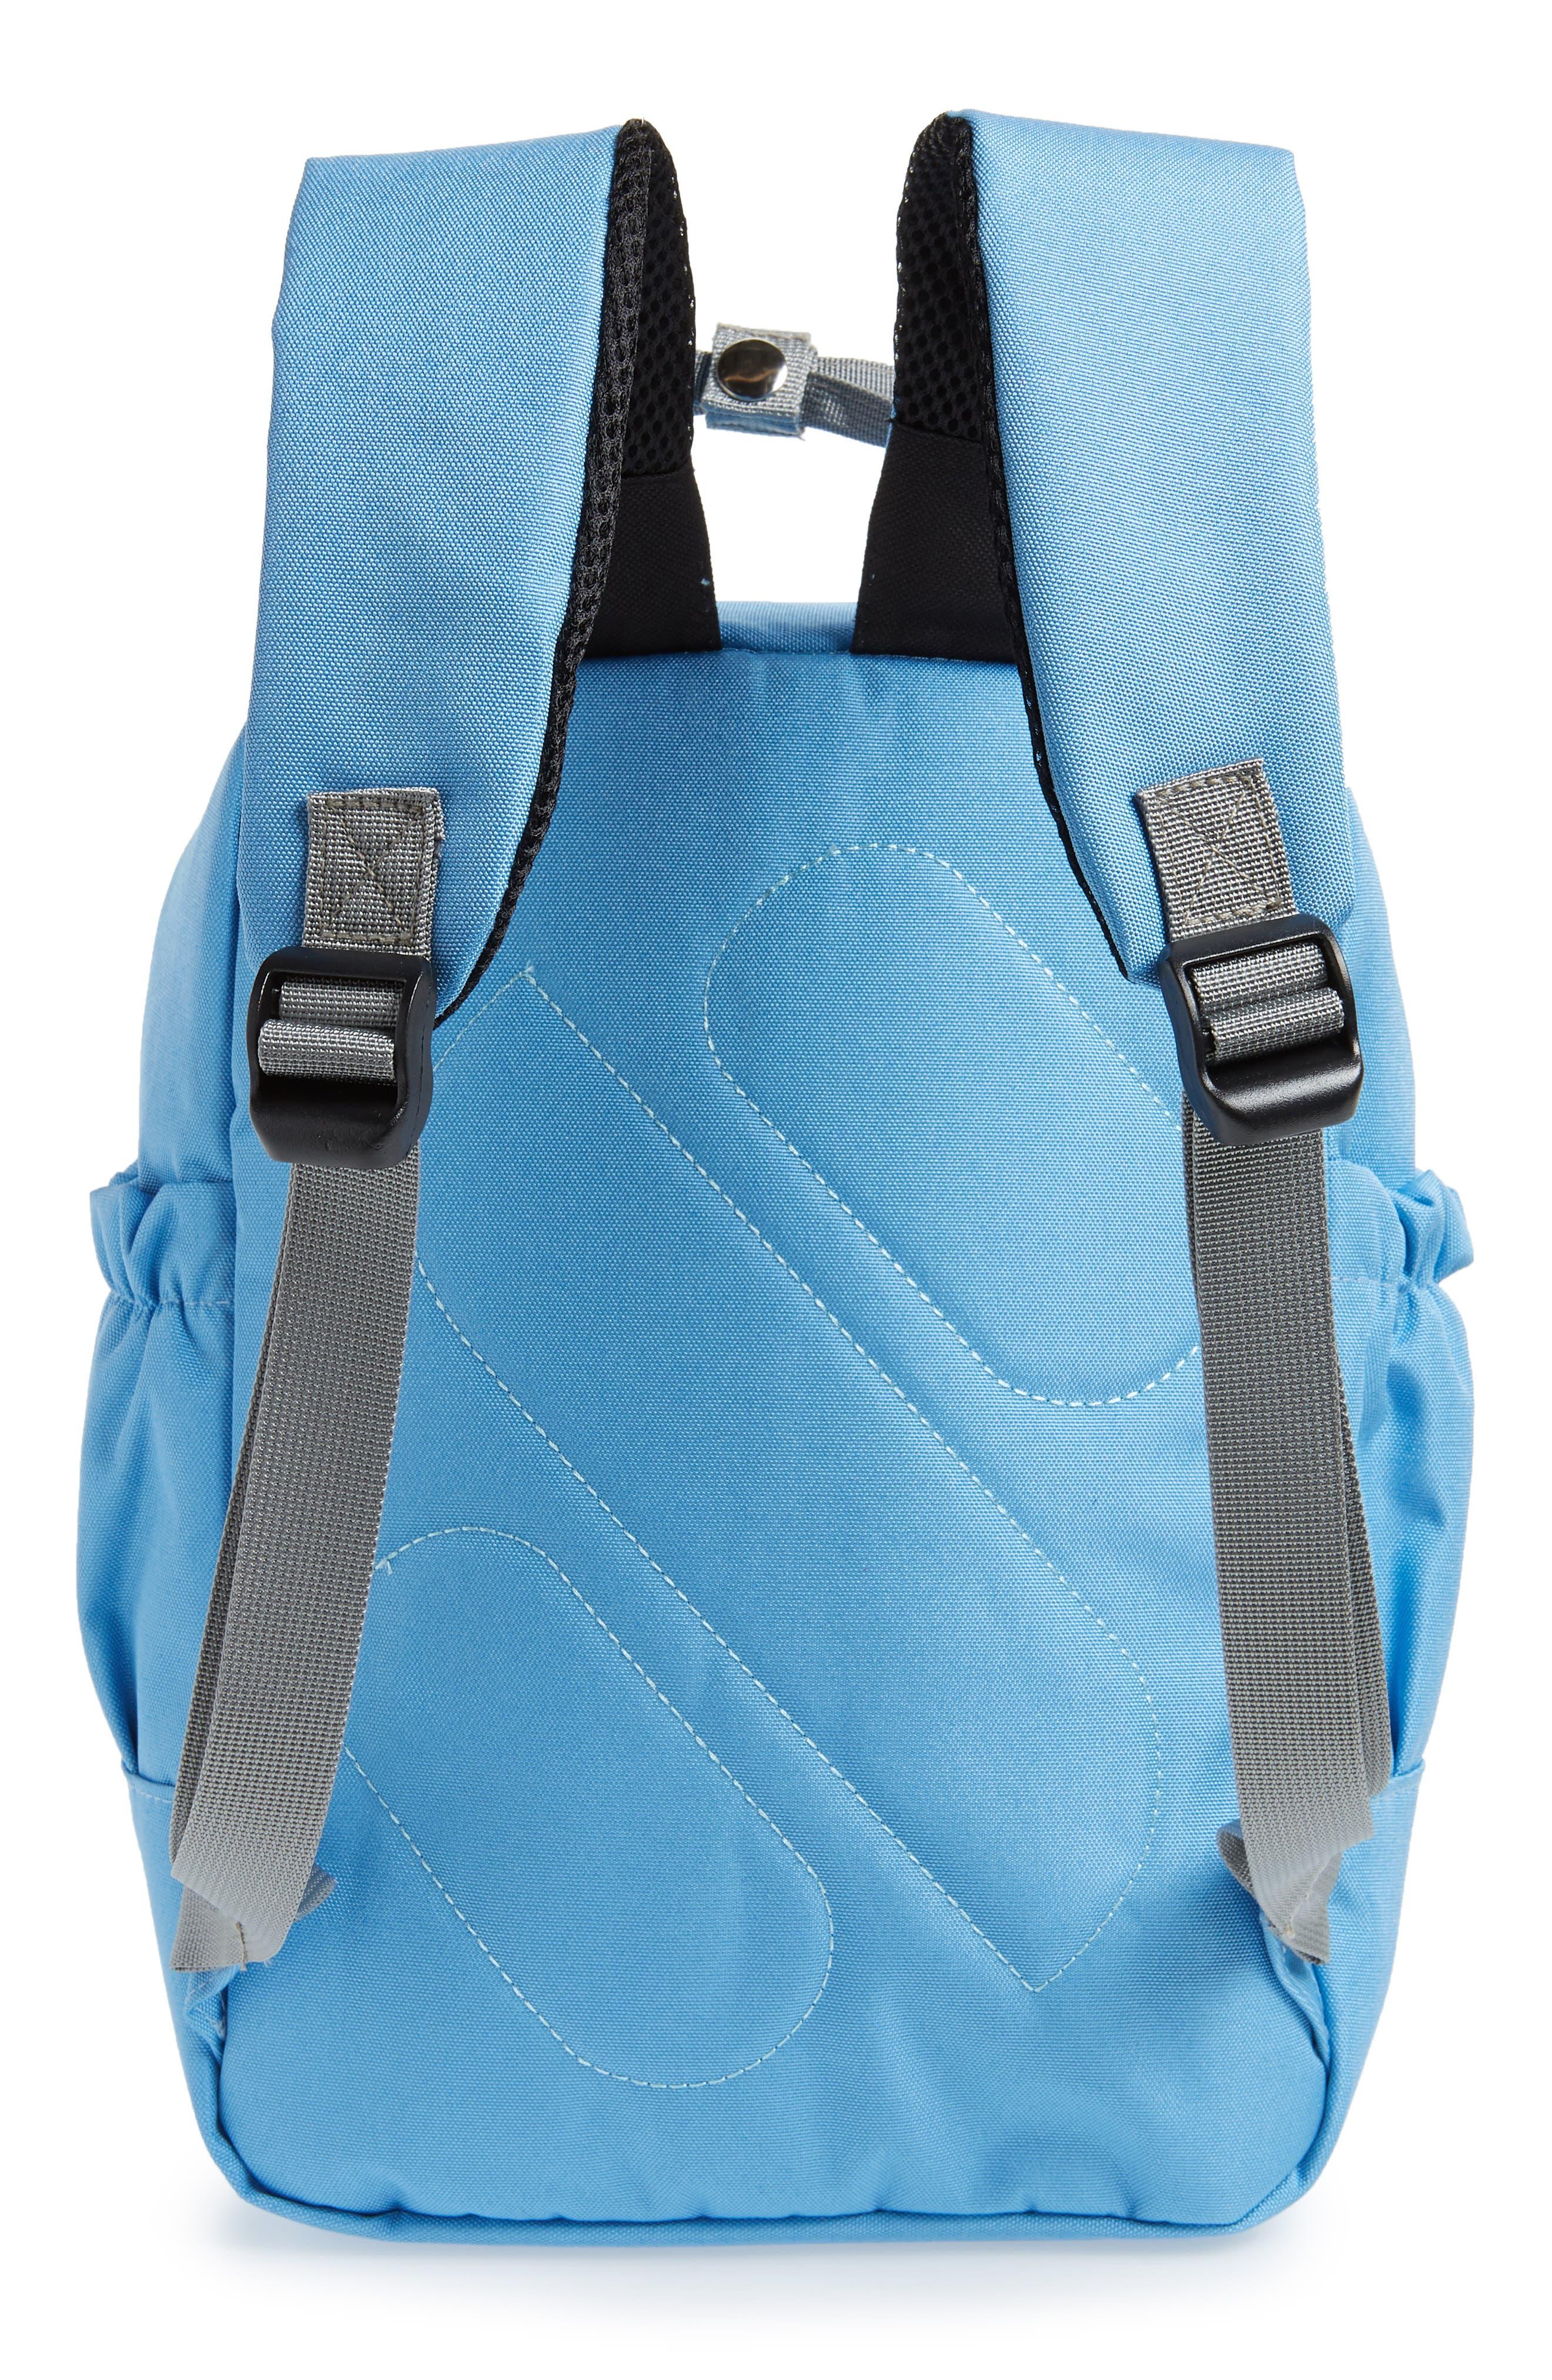 Solid Backpack,                             Alternate thumbnail 2, color,                             Light Blue/ Grey